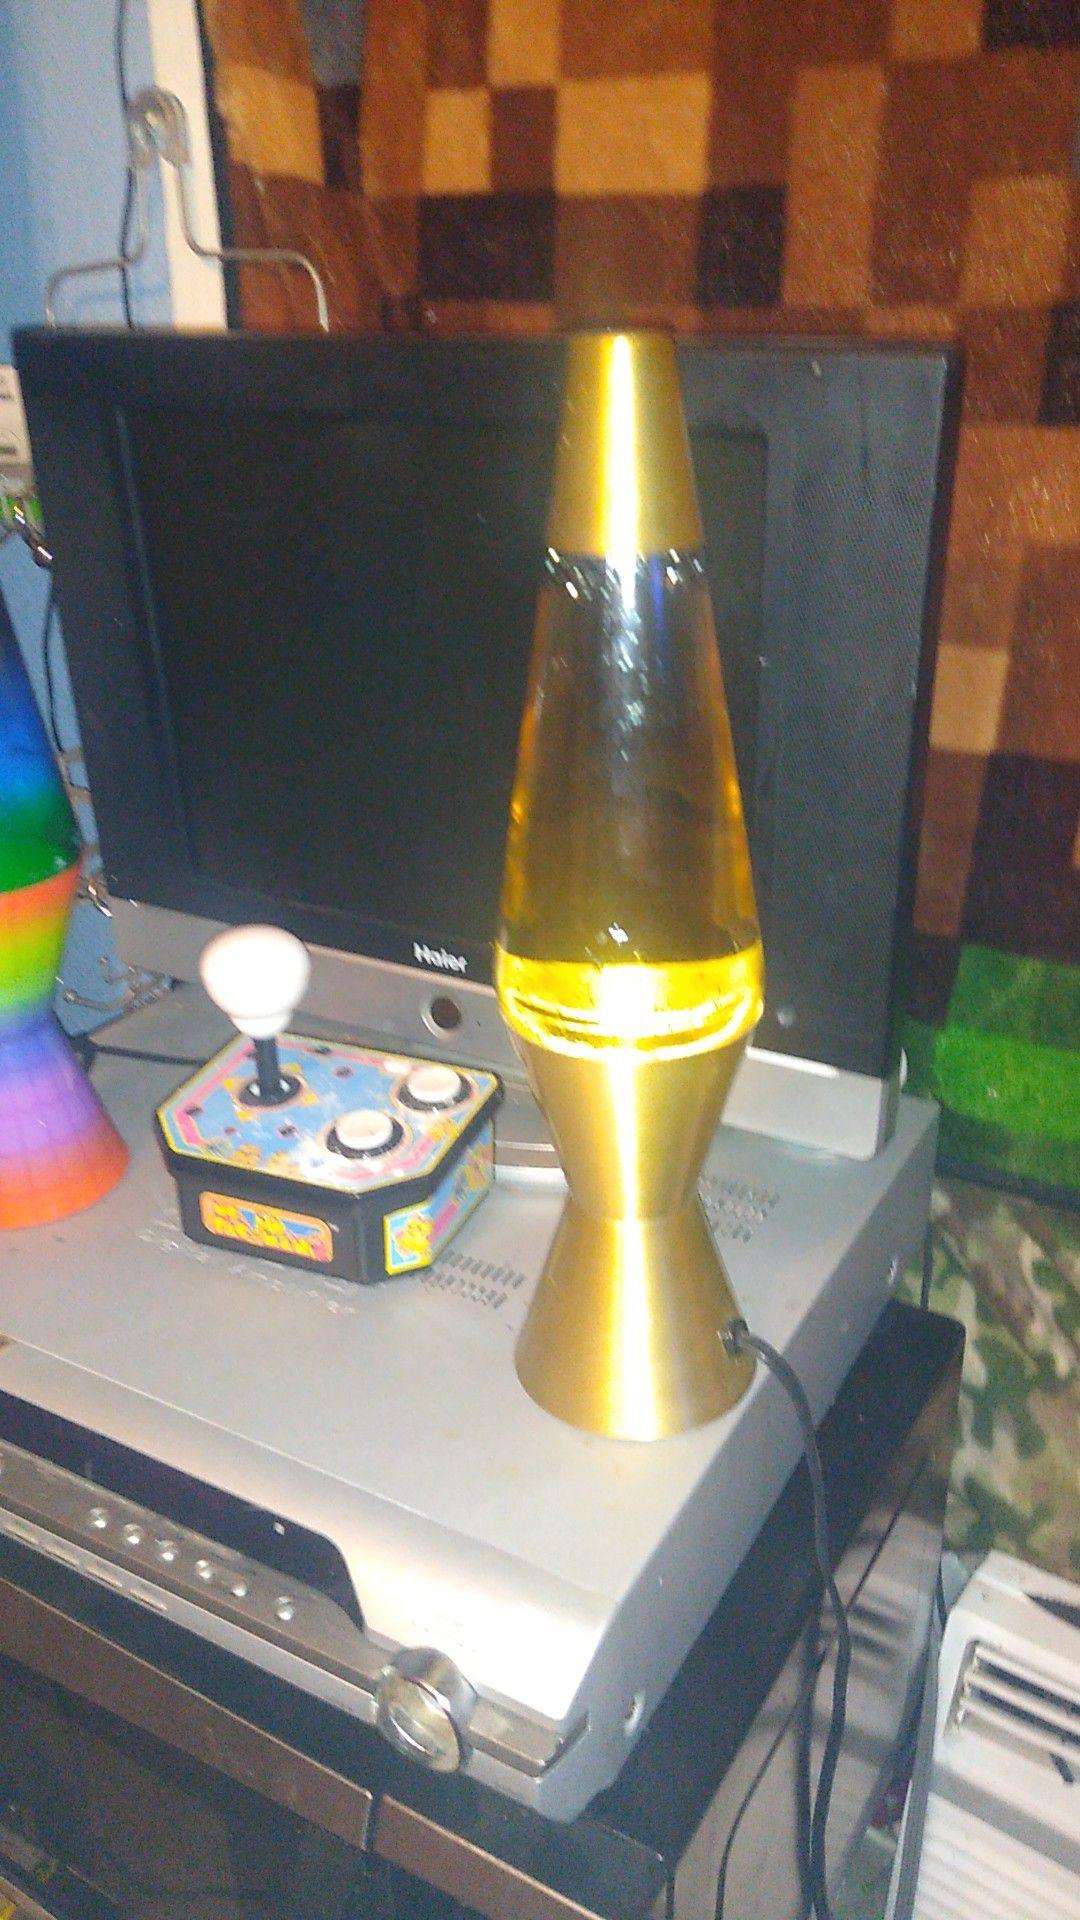 2 lava lamps need bulbs